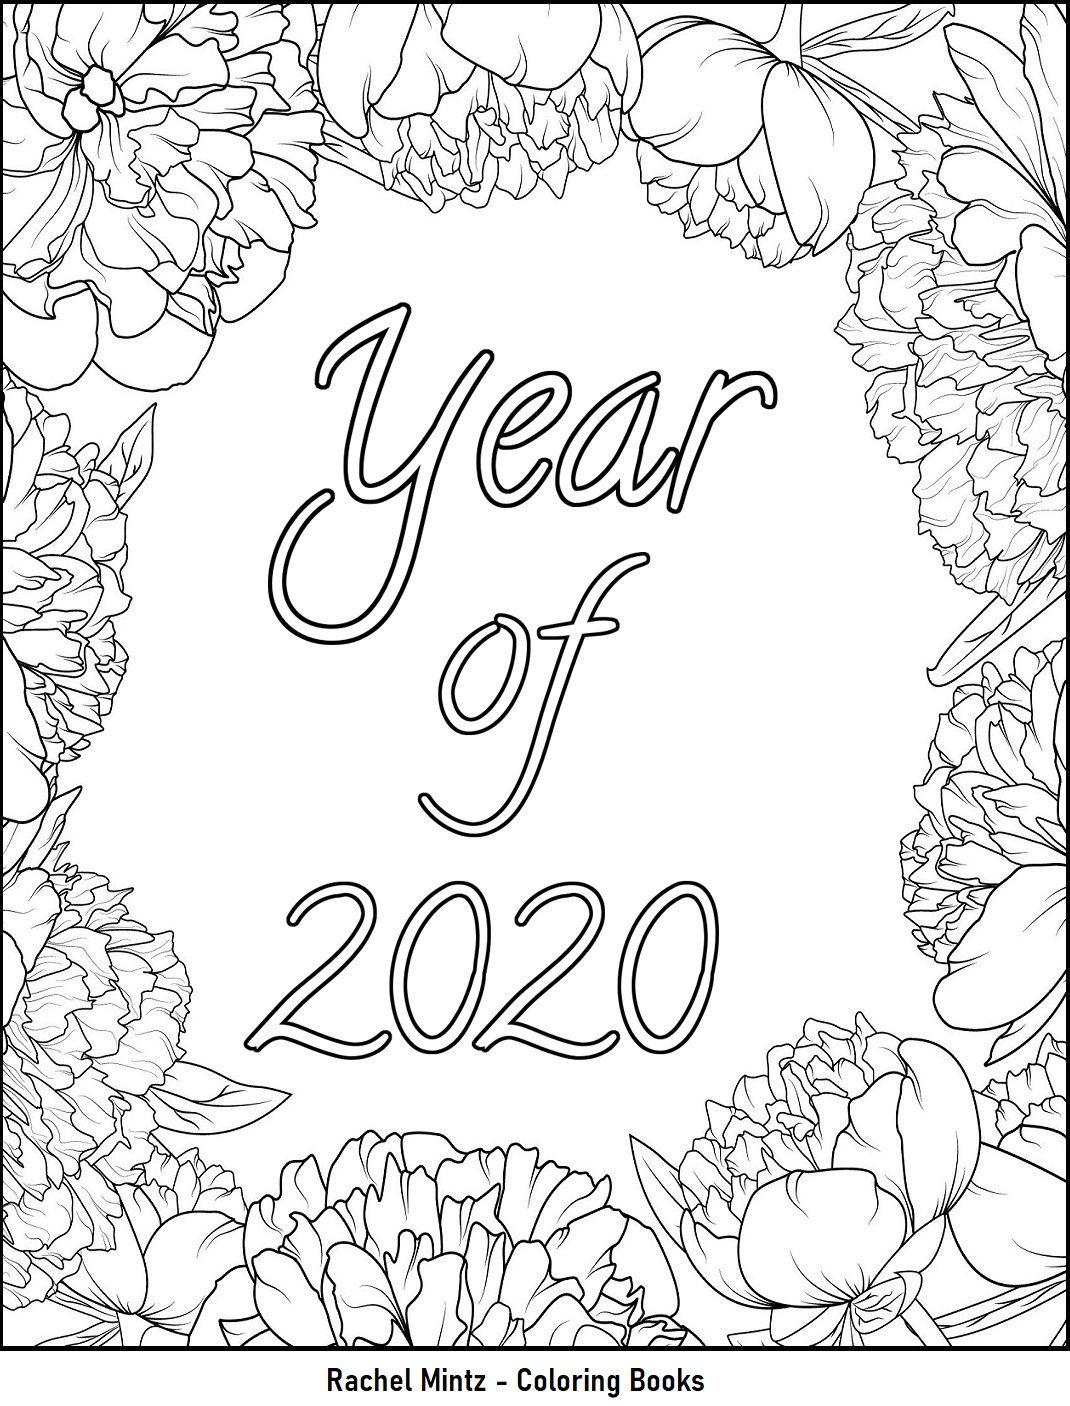 Happy New Year 2020 Home Of Rachel Mintz Coloring Books Coloring Books Happy New Year 2020 Coloring Pages